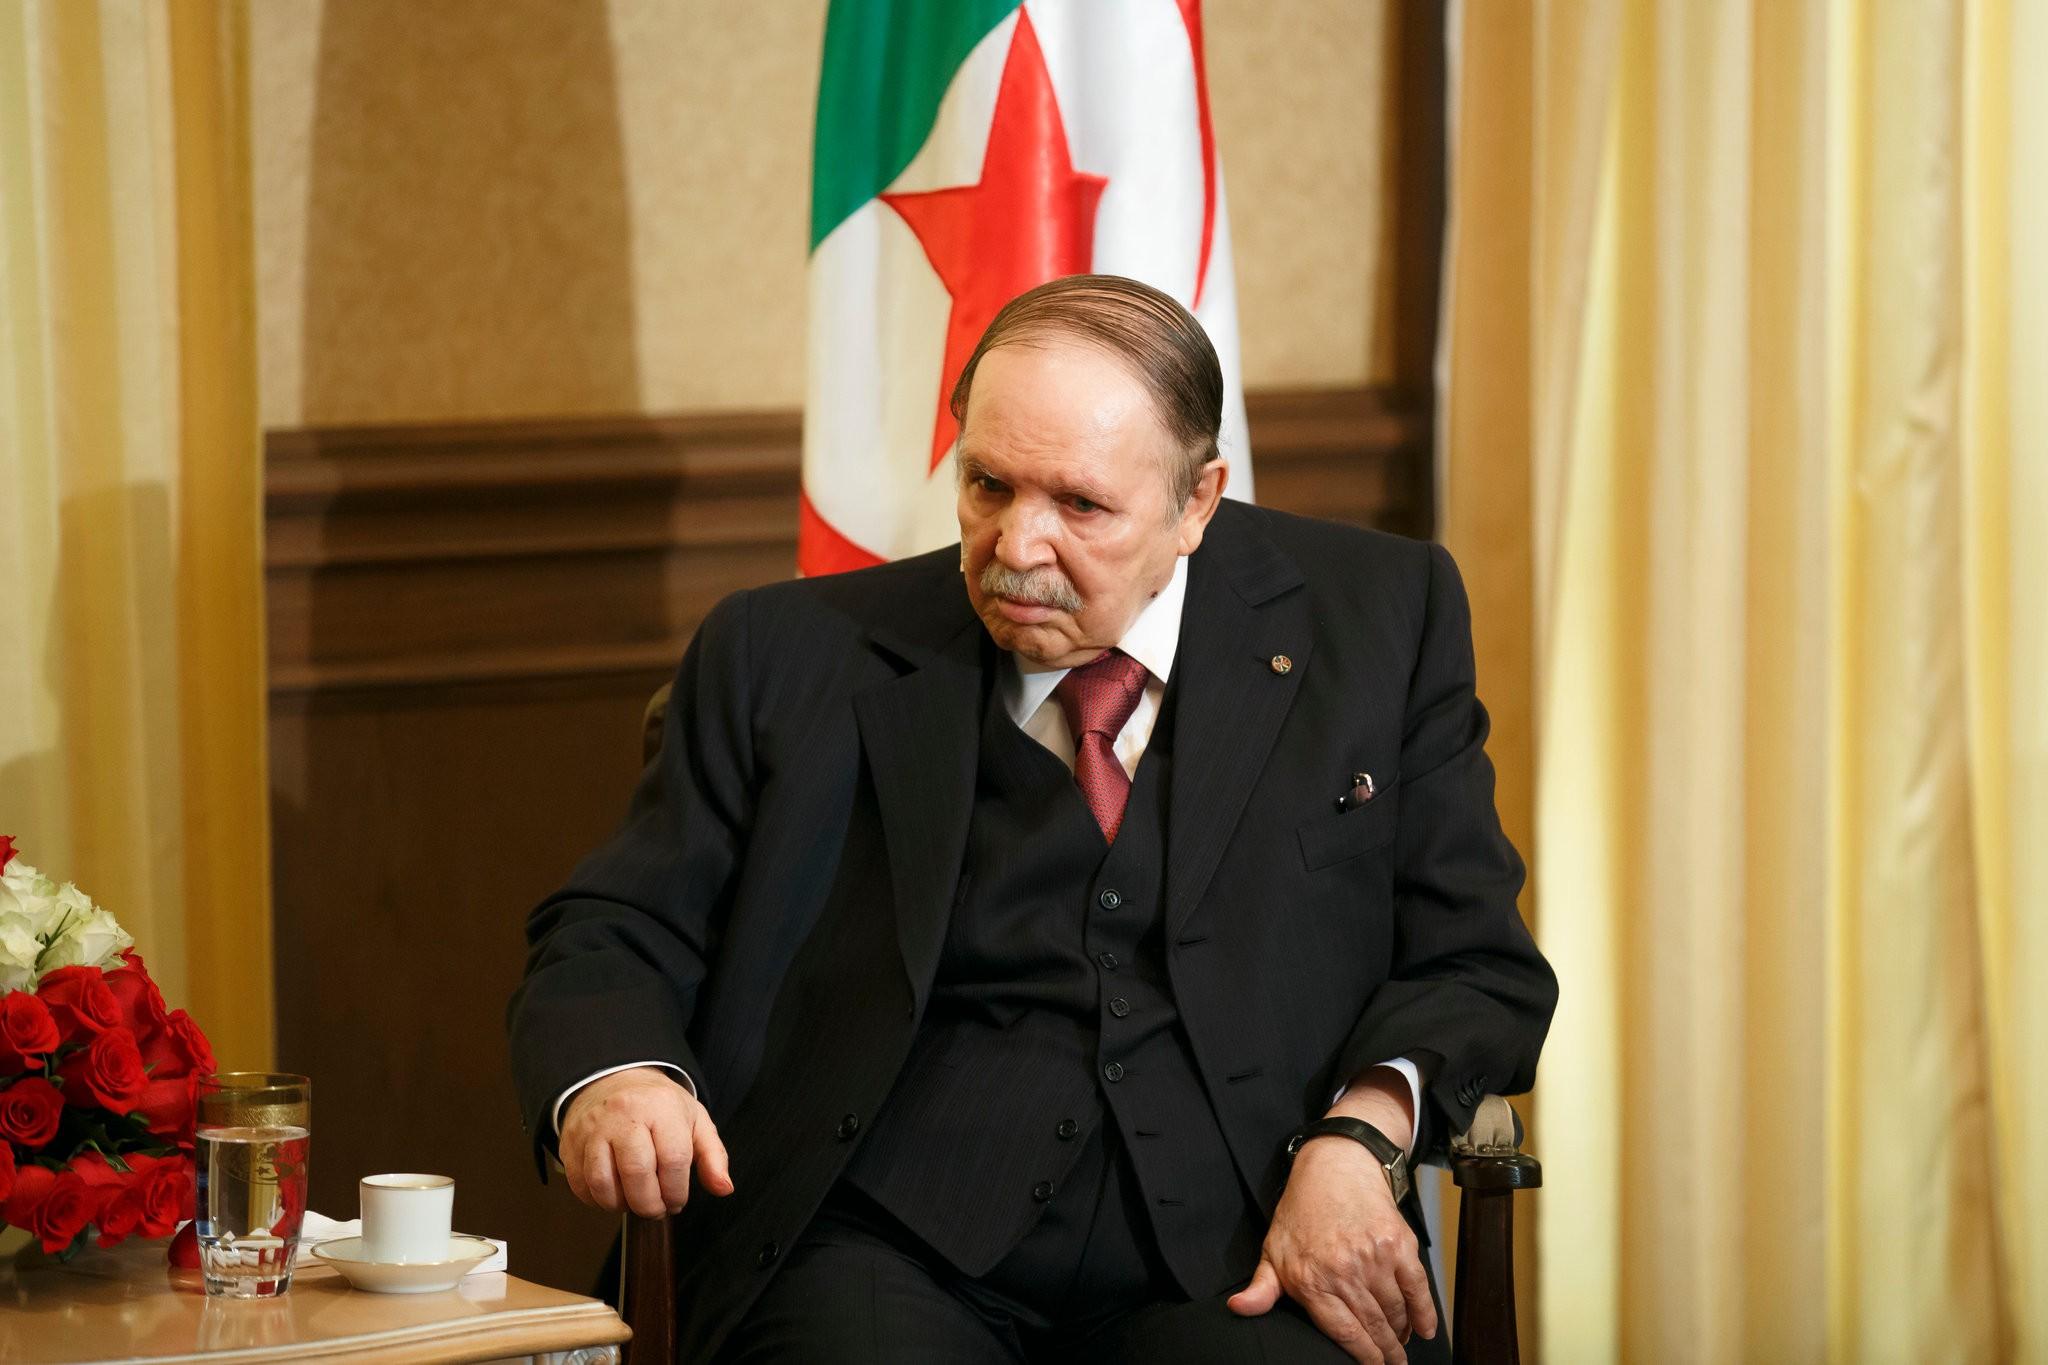 Algeria's president, Abdelaziz Bouteflika, in 2015. Long ill, Mr. Bouteflika announced on Tuesday that he had resigned. Credit Thomas Trutschel/Photothek, via Getty Images